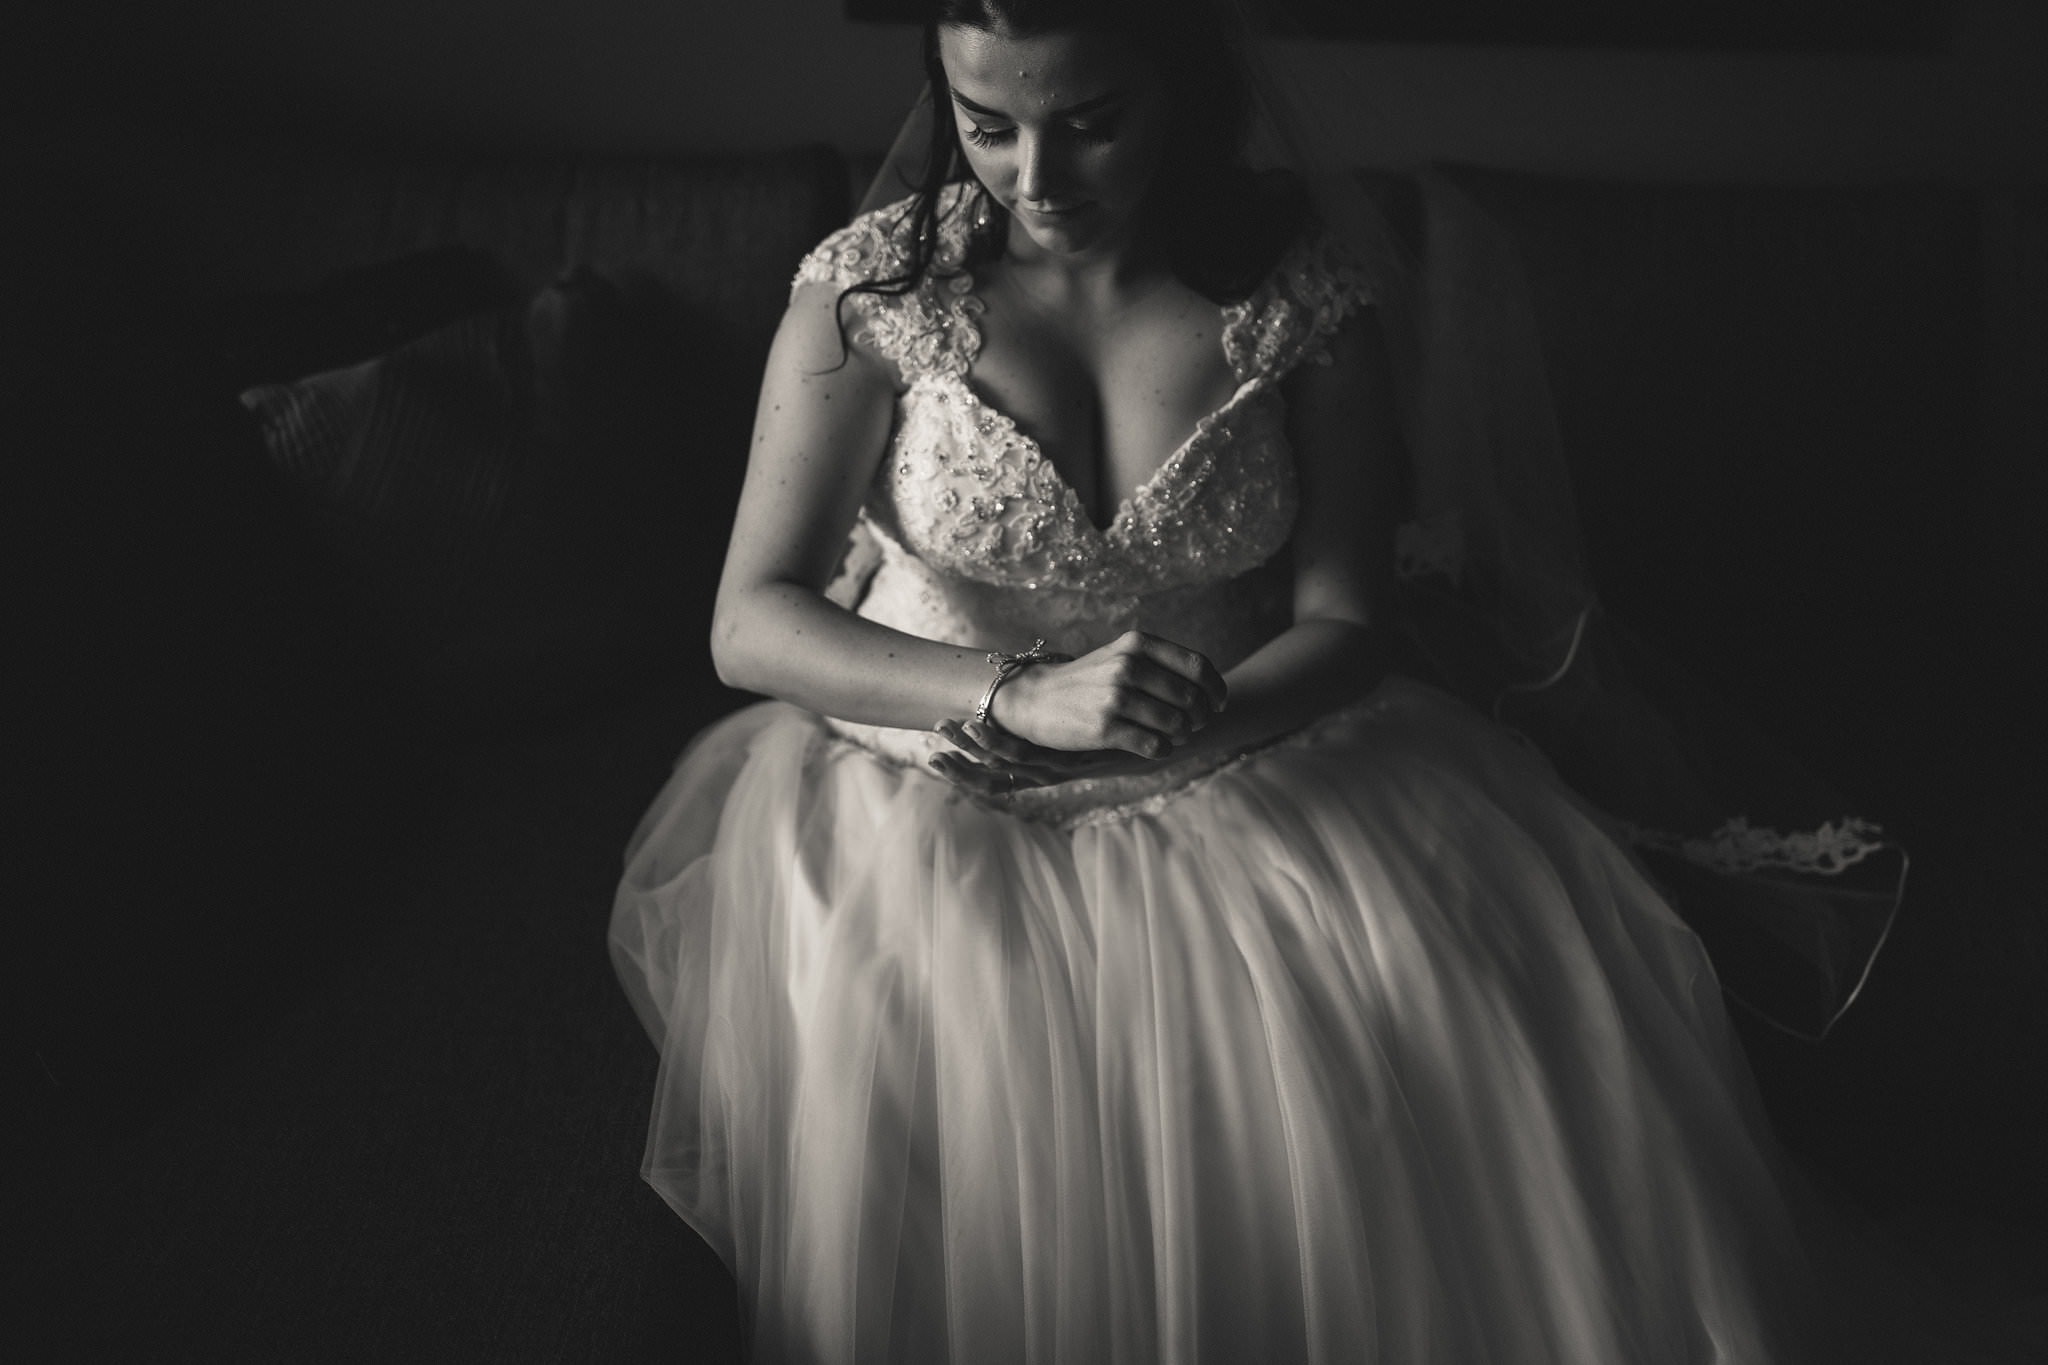 Kristen Adam Kindred Loft Whitby Wedding Photos 56 - Durham Wedding Photographer: Kindred Loft Wedding Photos